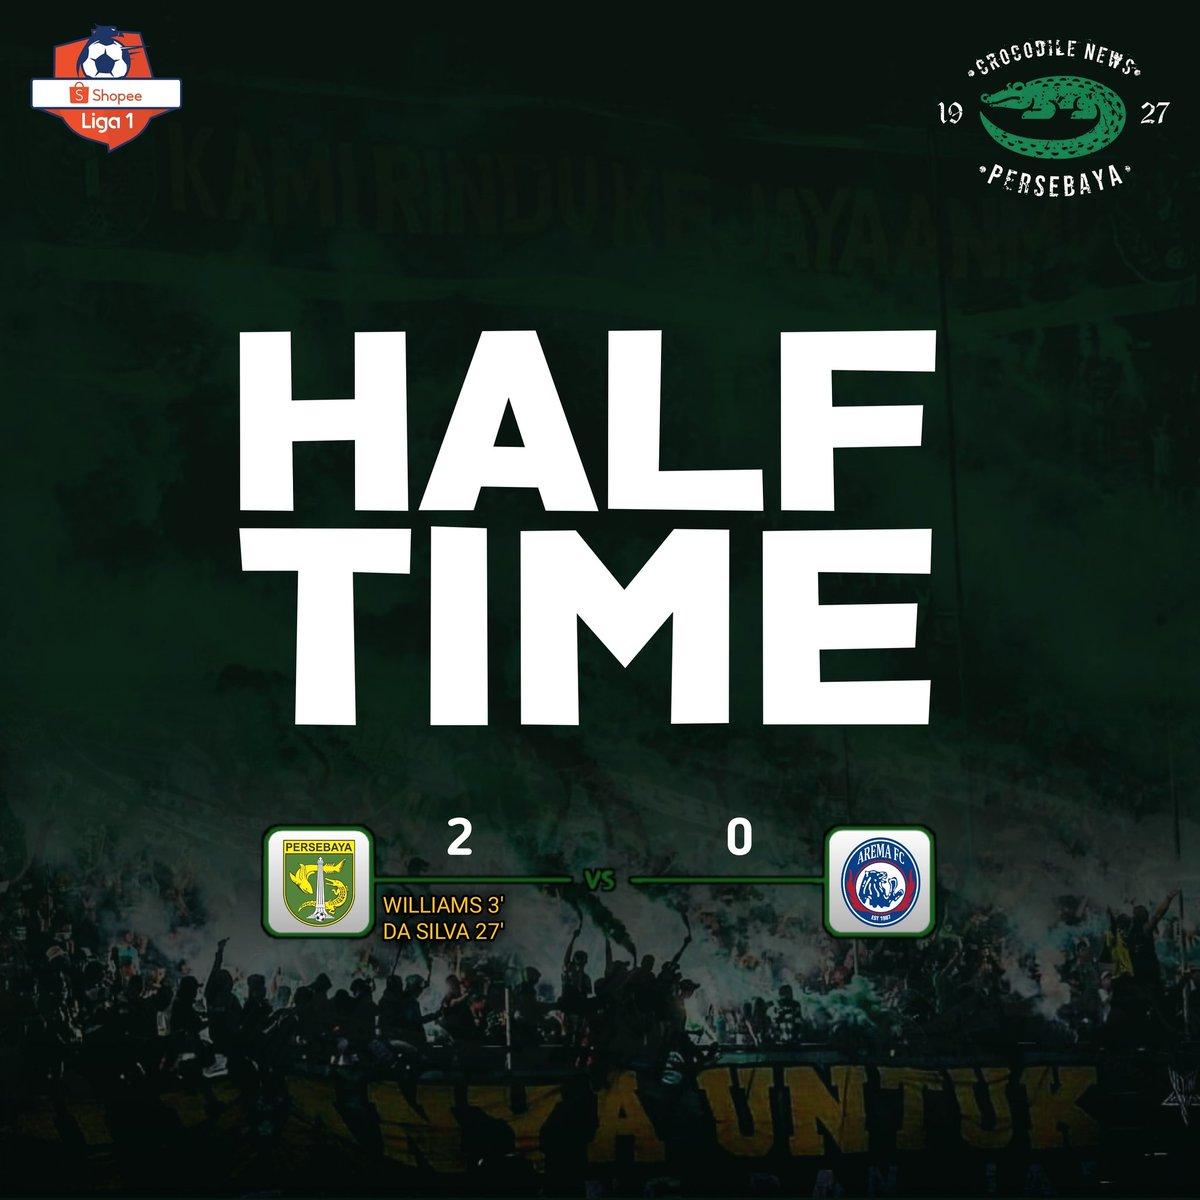 Half Time: Persebaya 2-0 Arema Fc _ ⚽️ Aryn Williams 3' ⚽️ David Da Silva 27'  Masih ada babak kedua! Ayo tambah lagi Jol!  #Persebaya #bajolijo #greenforce #CrocodileNews #bonek #bonita #PersebayaDay